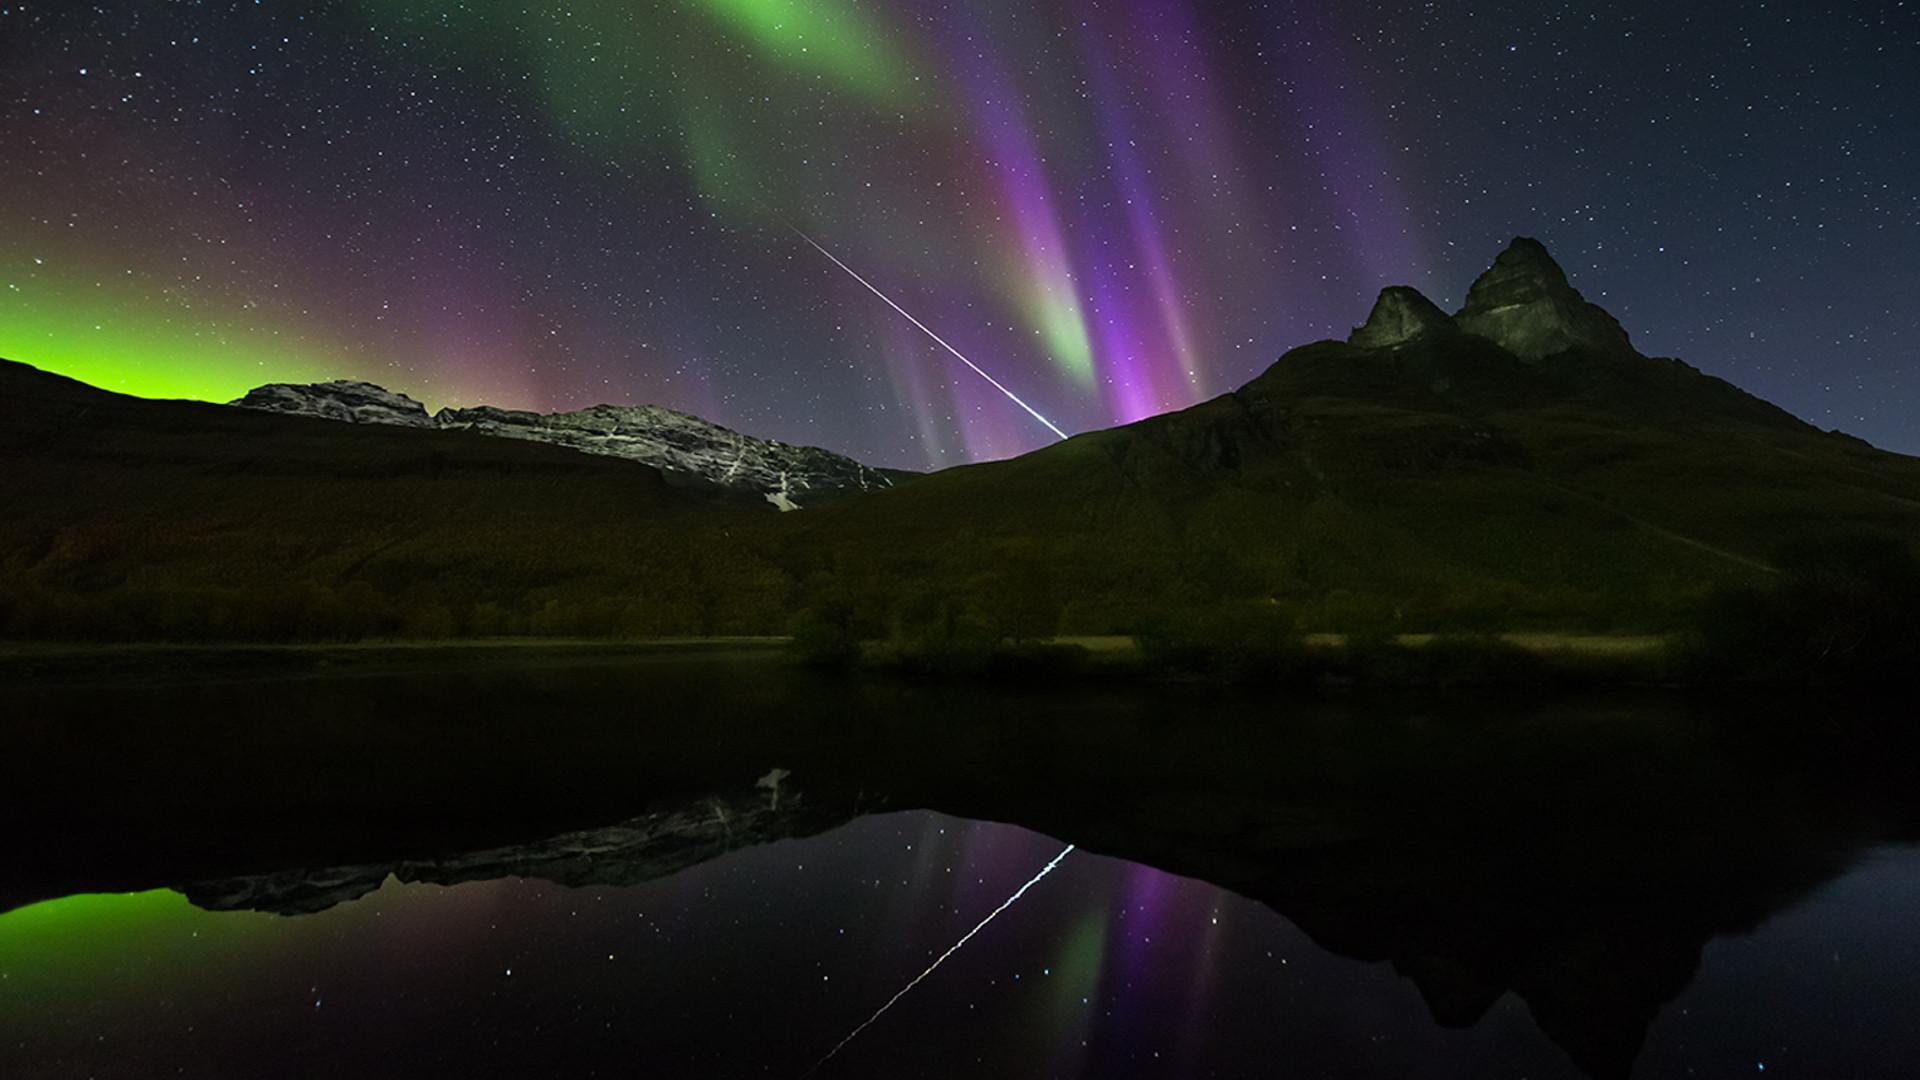 aurora borealis full hd wallpaper and background image